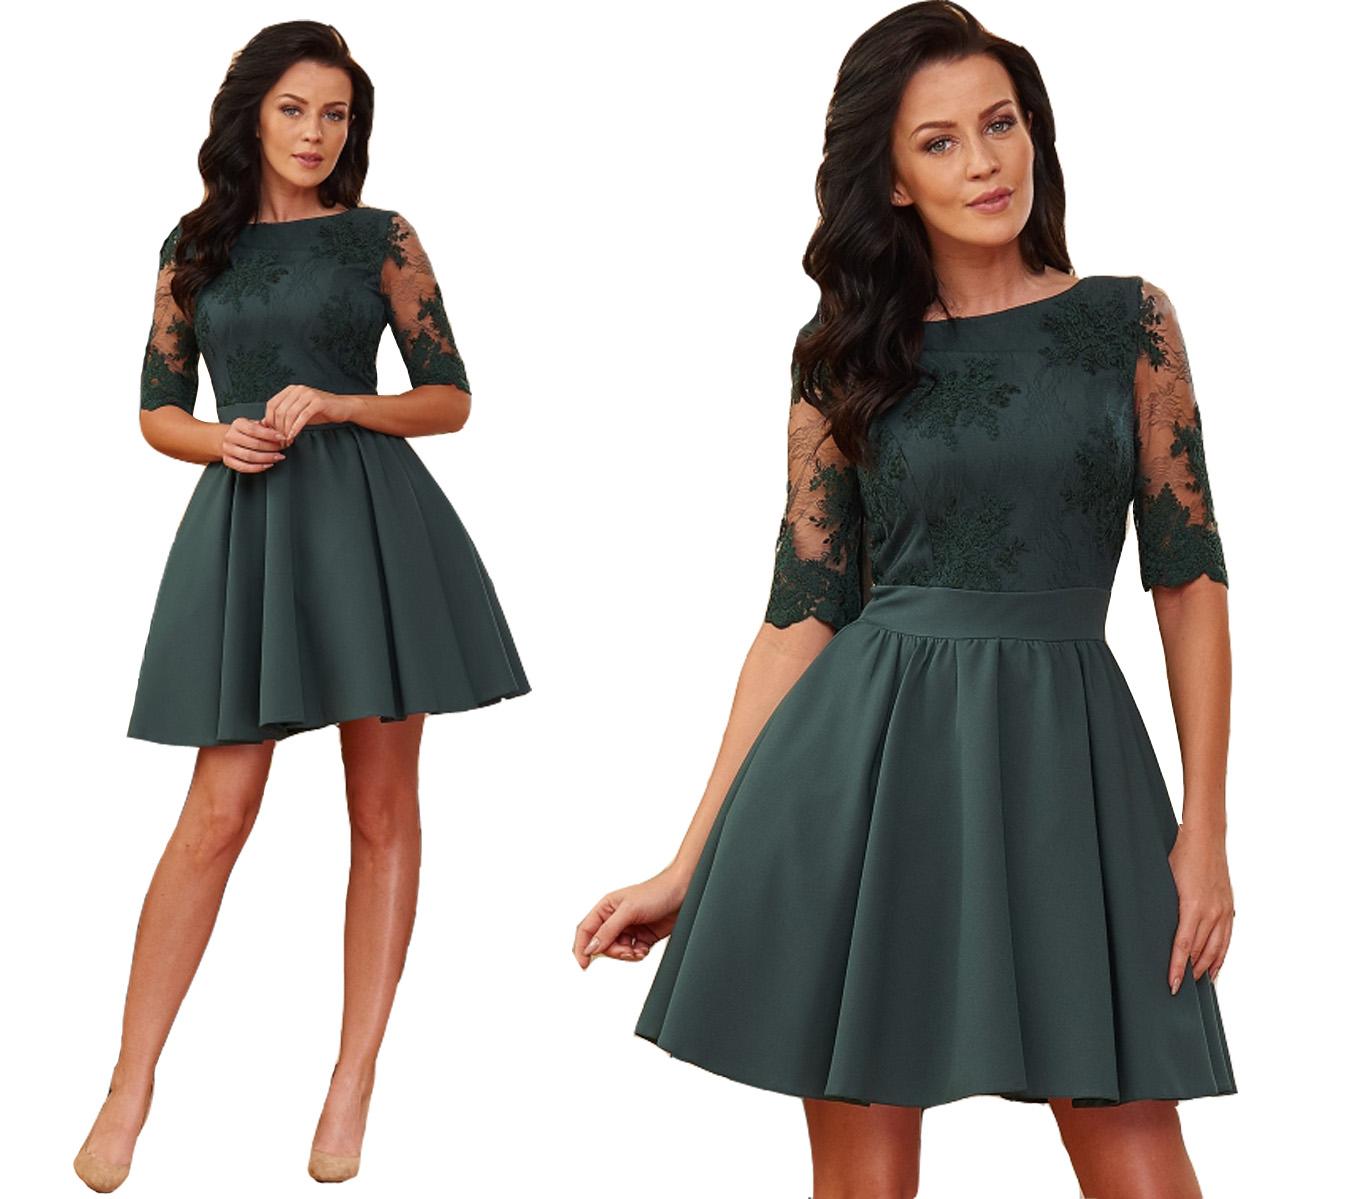 d55be94308 Sukienka elegancka wesele plecy 40 koronka - 7080953258 - oficjalne ...